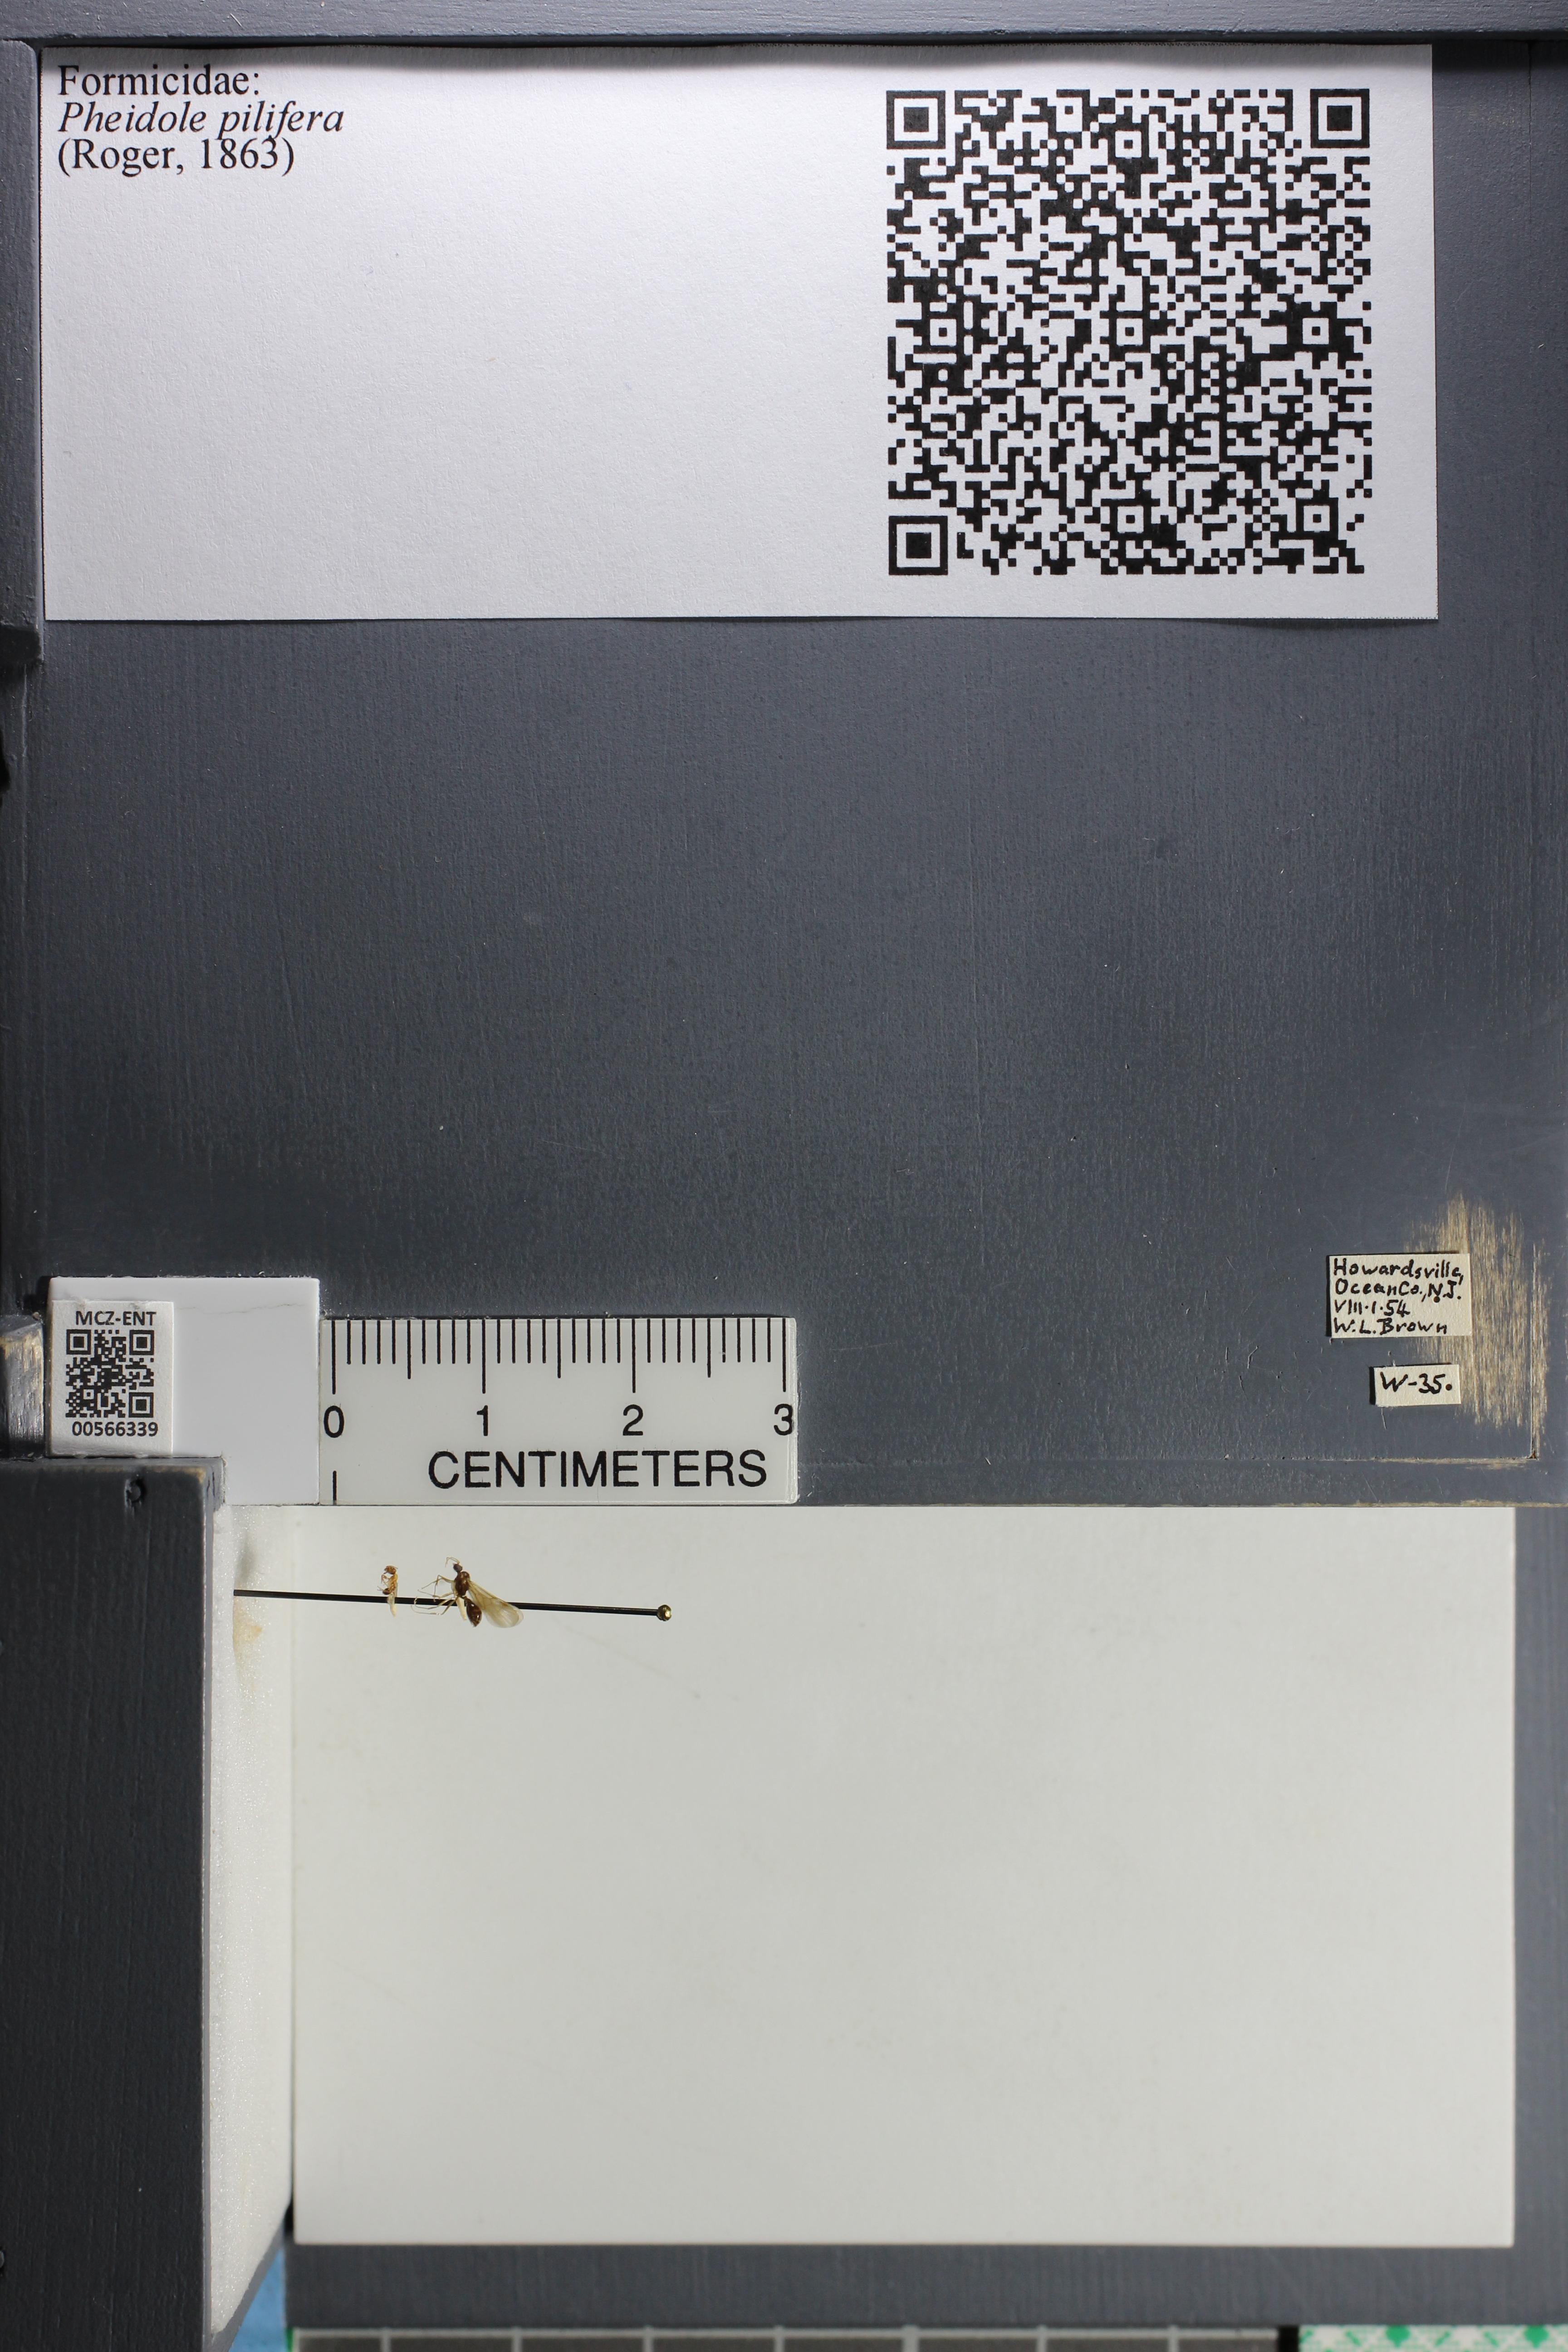 Media of type image, MCZ:Ent:566339 Identified as Pheidole pilifera.